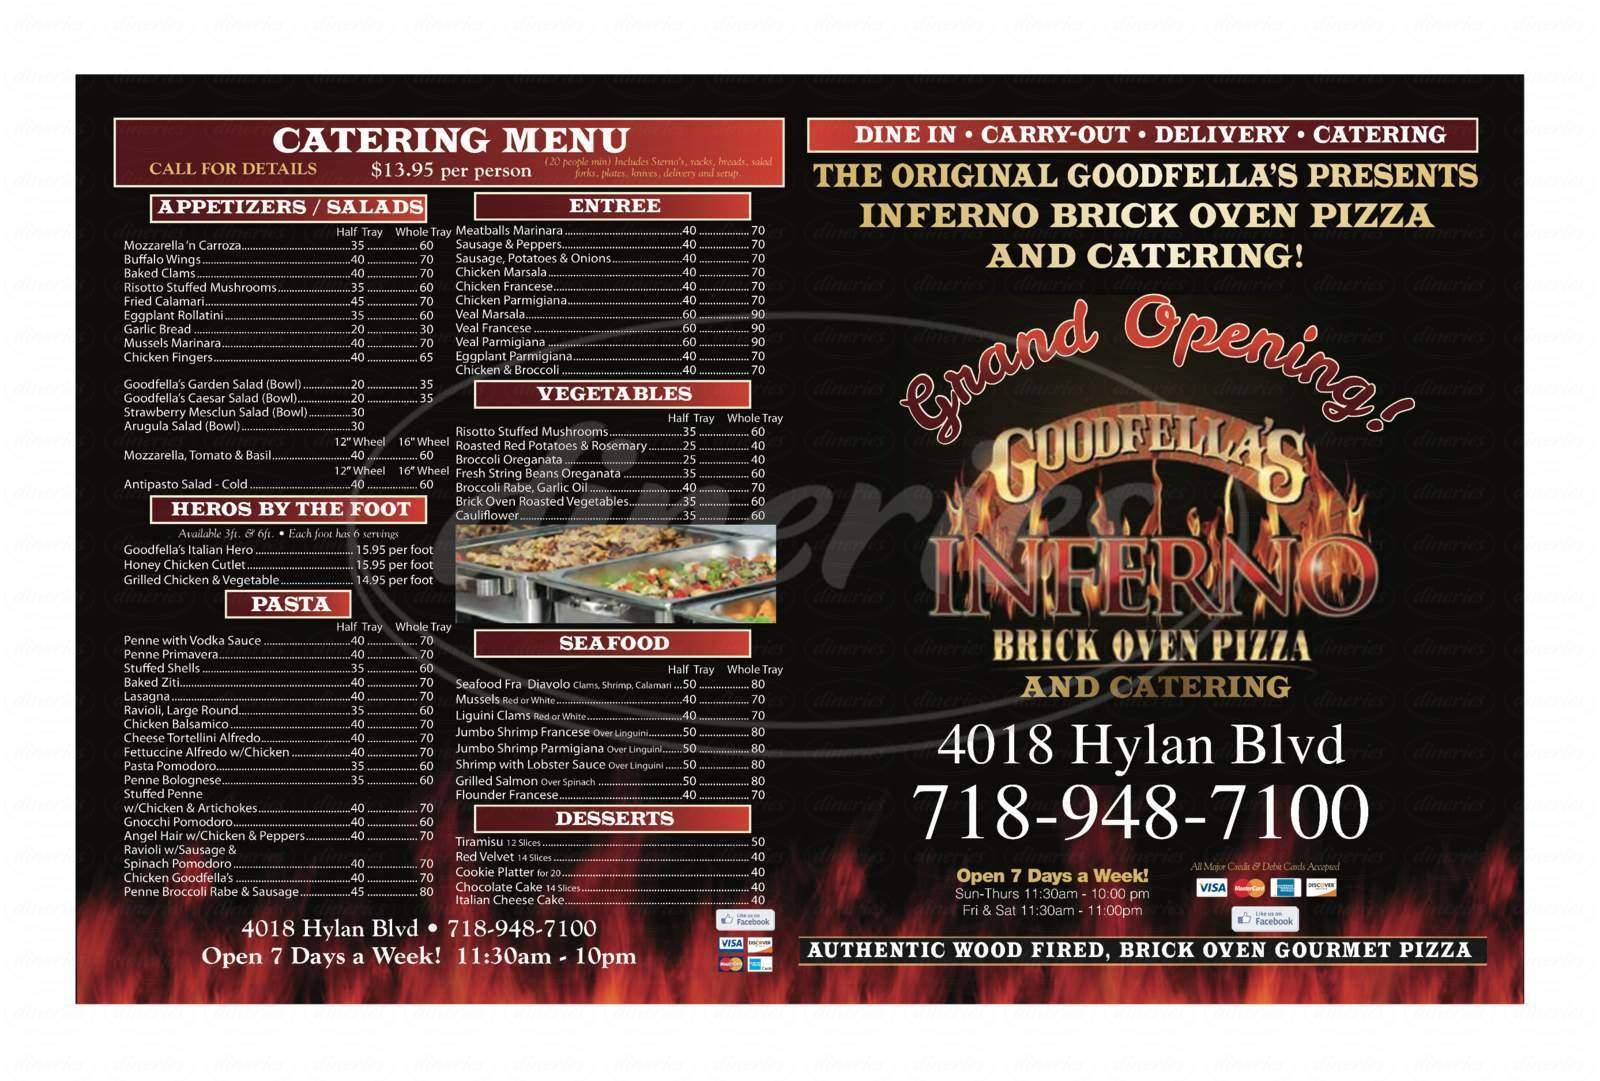 menu for Goodfellas Inferno